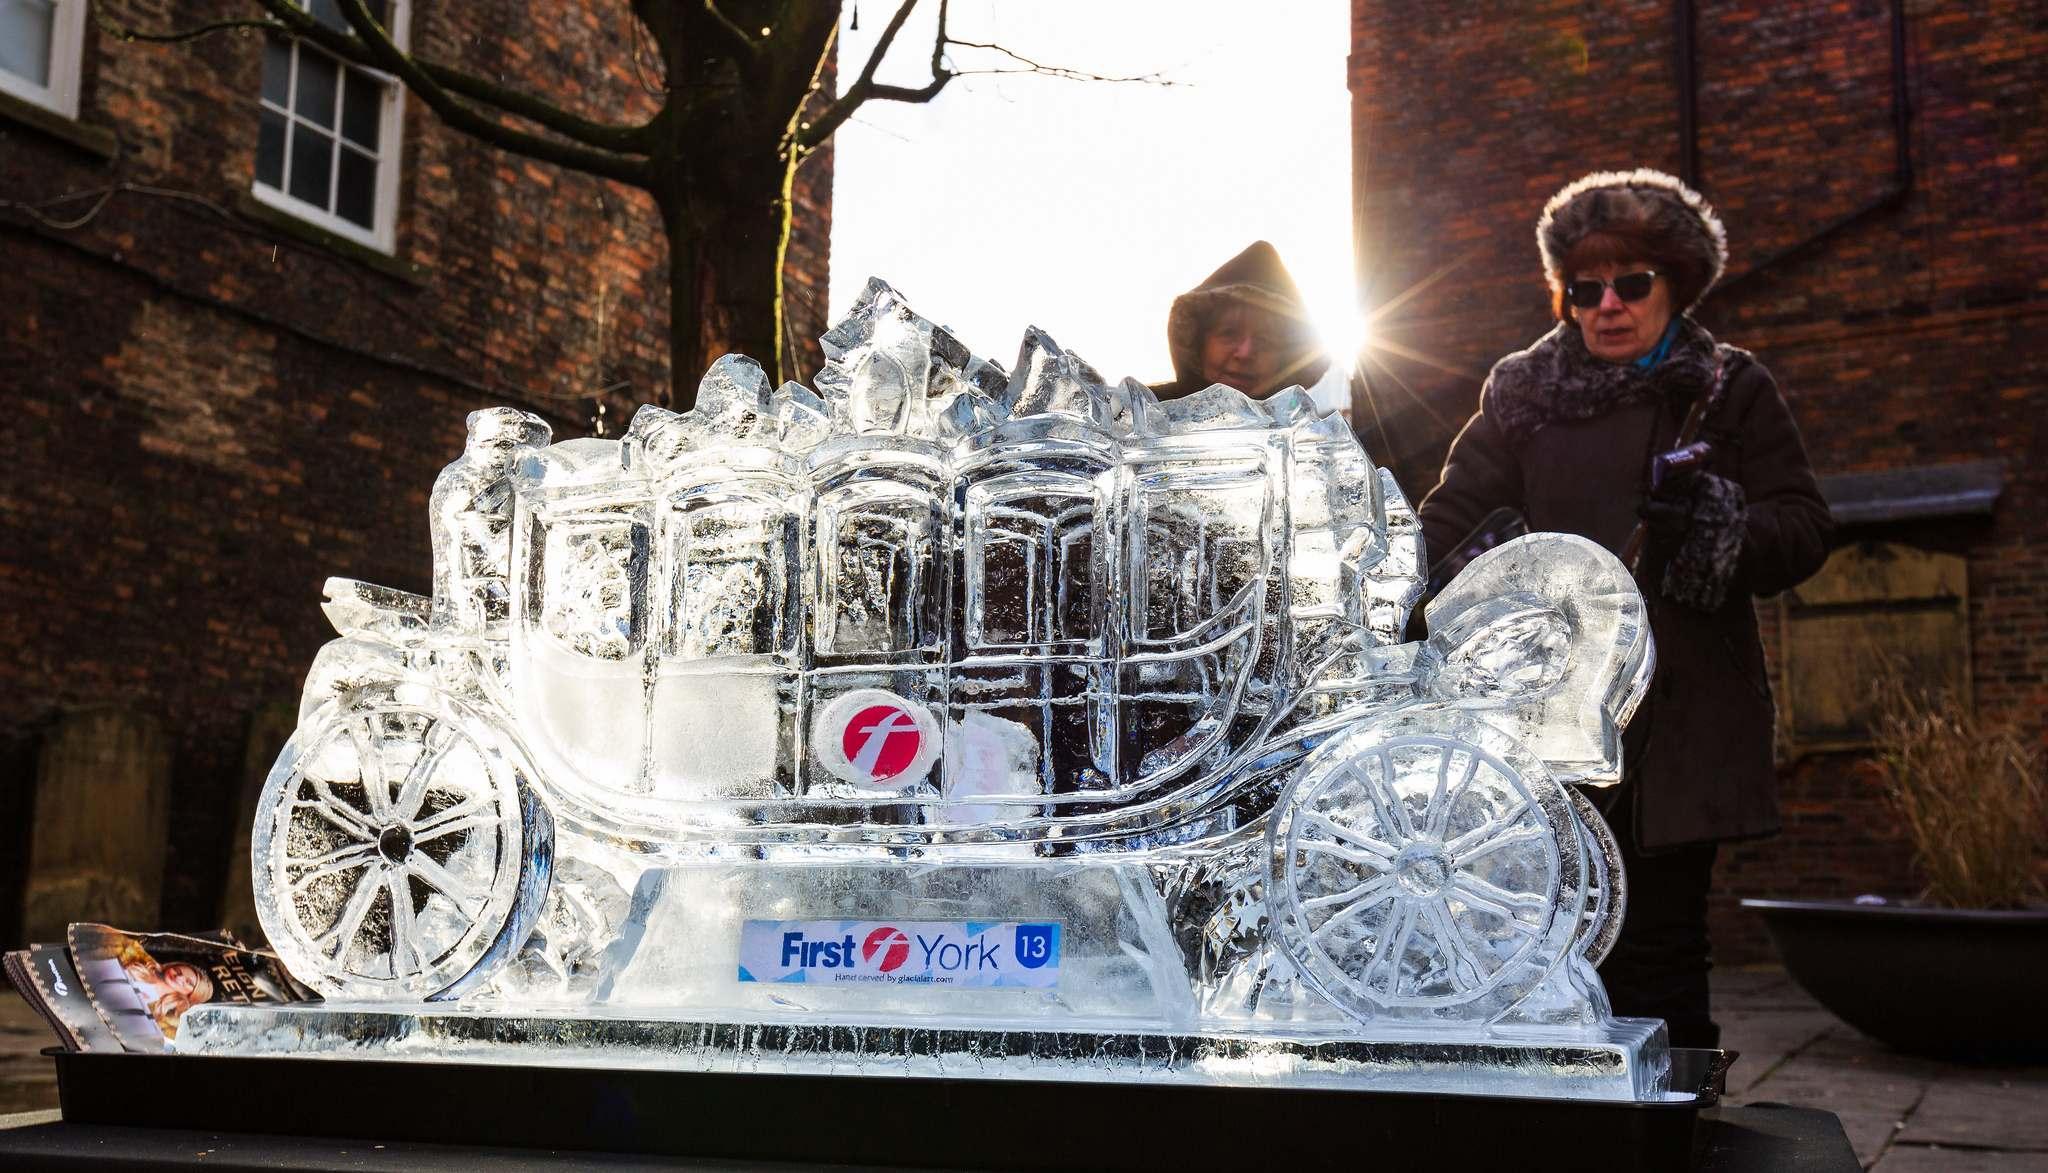 ice trail8 York Ice Trail 2019